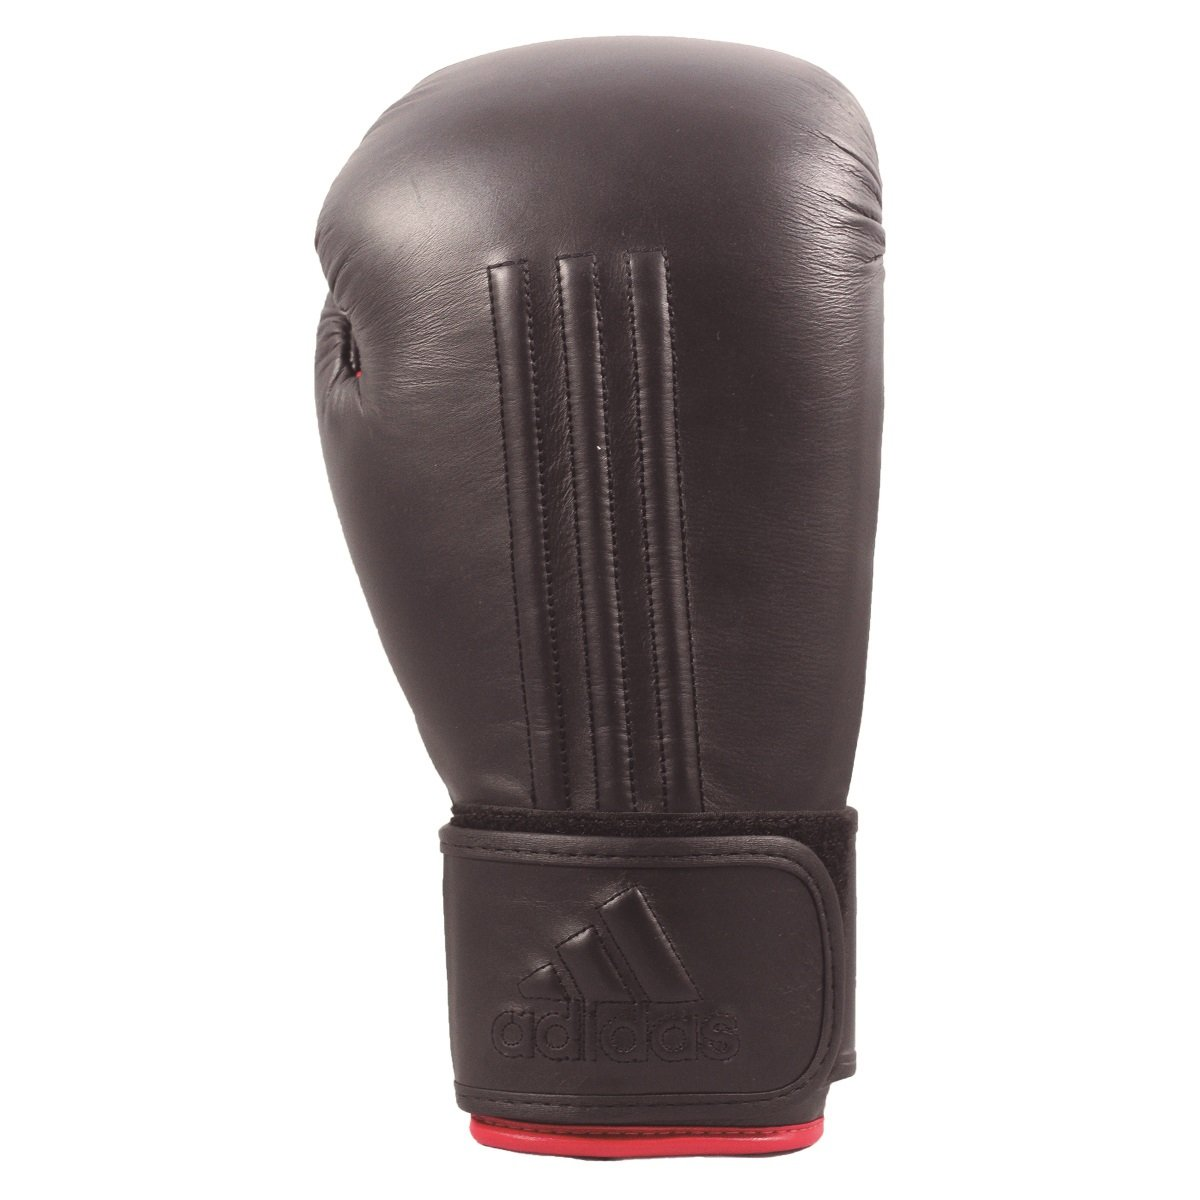 en progreso barricada índice  Luva de Boxe Adidas Energy 300 - 12 Oz | Netshoes